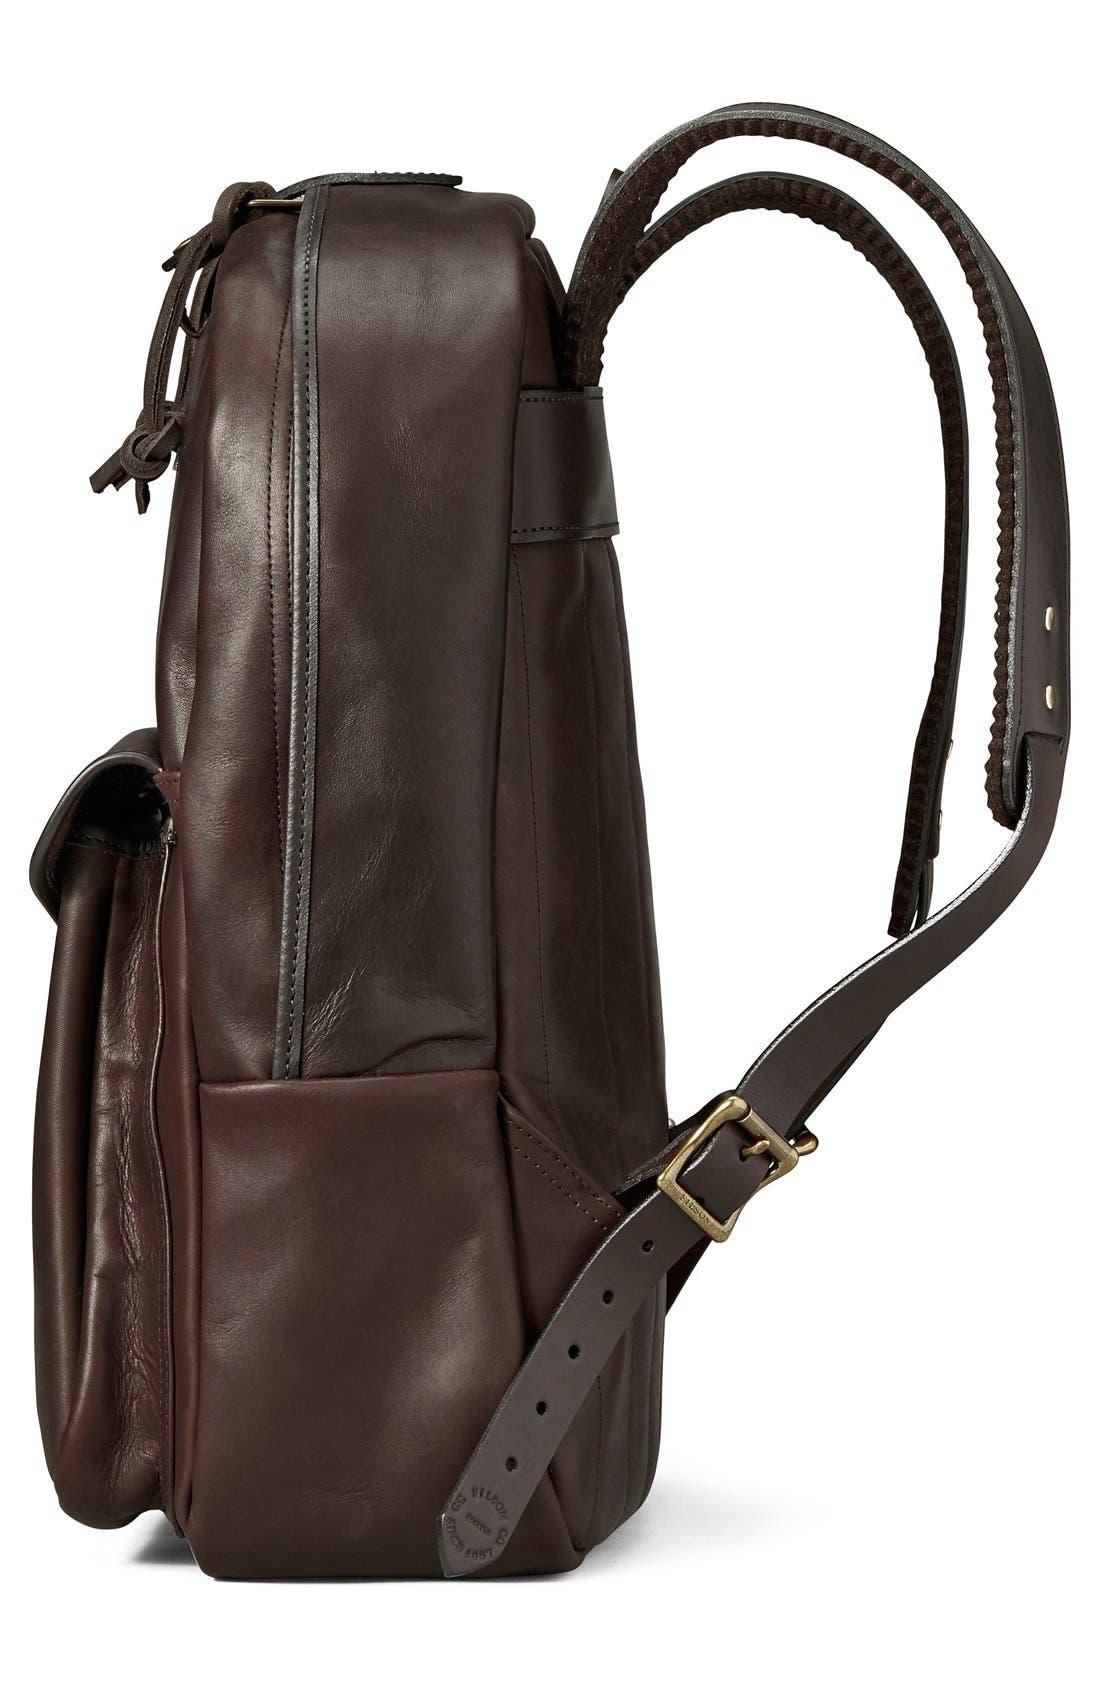 FILSON,                             Weatherproof Leather Backpack,                             Alternate thumbnail 4, color,                             206